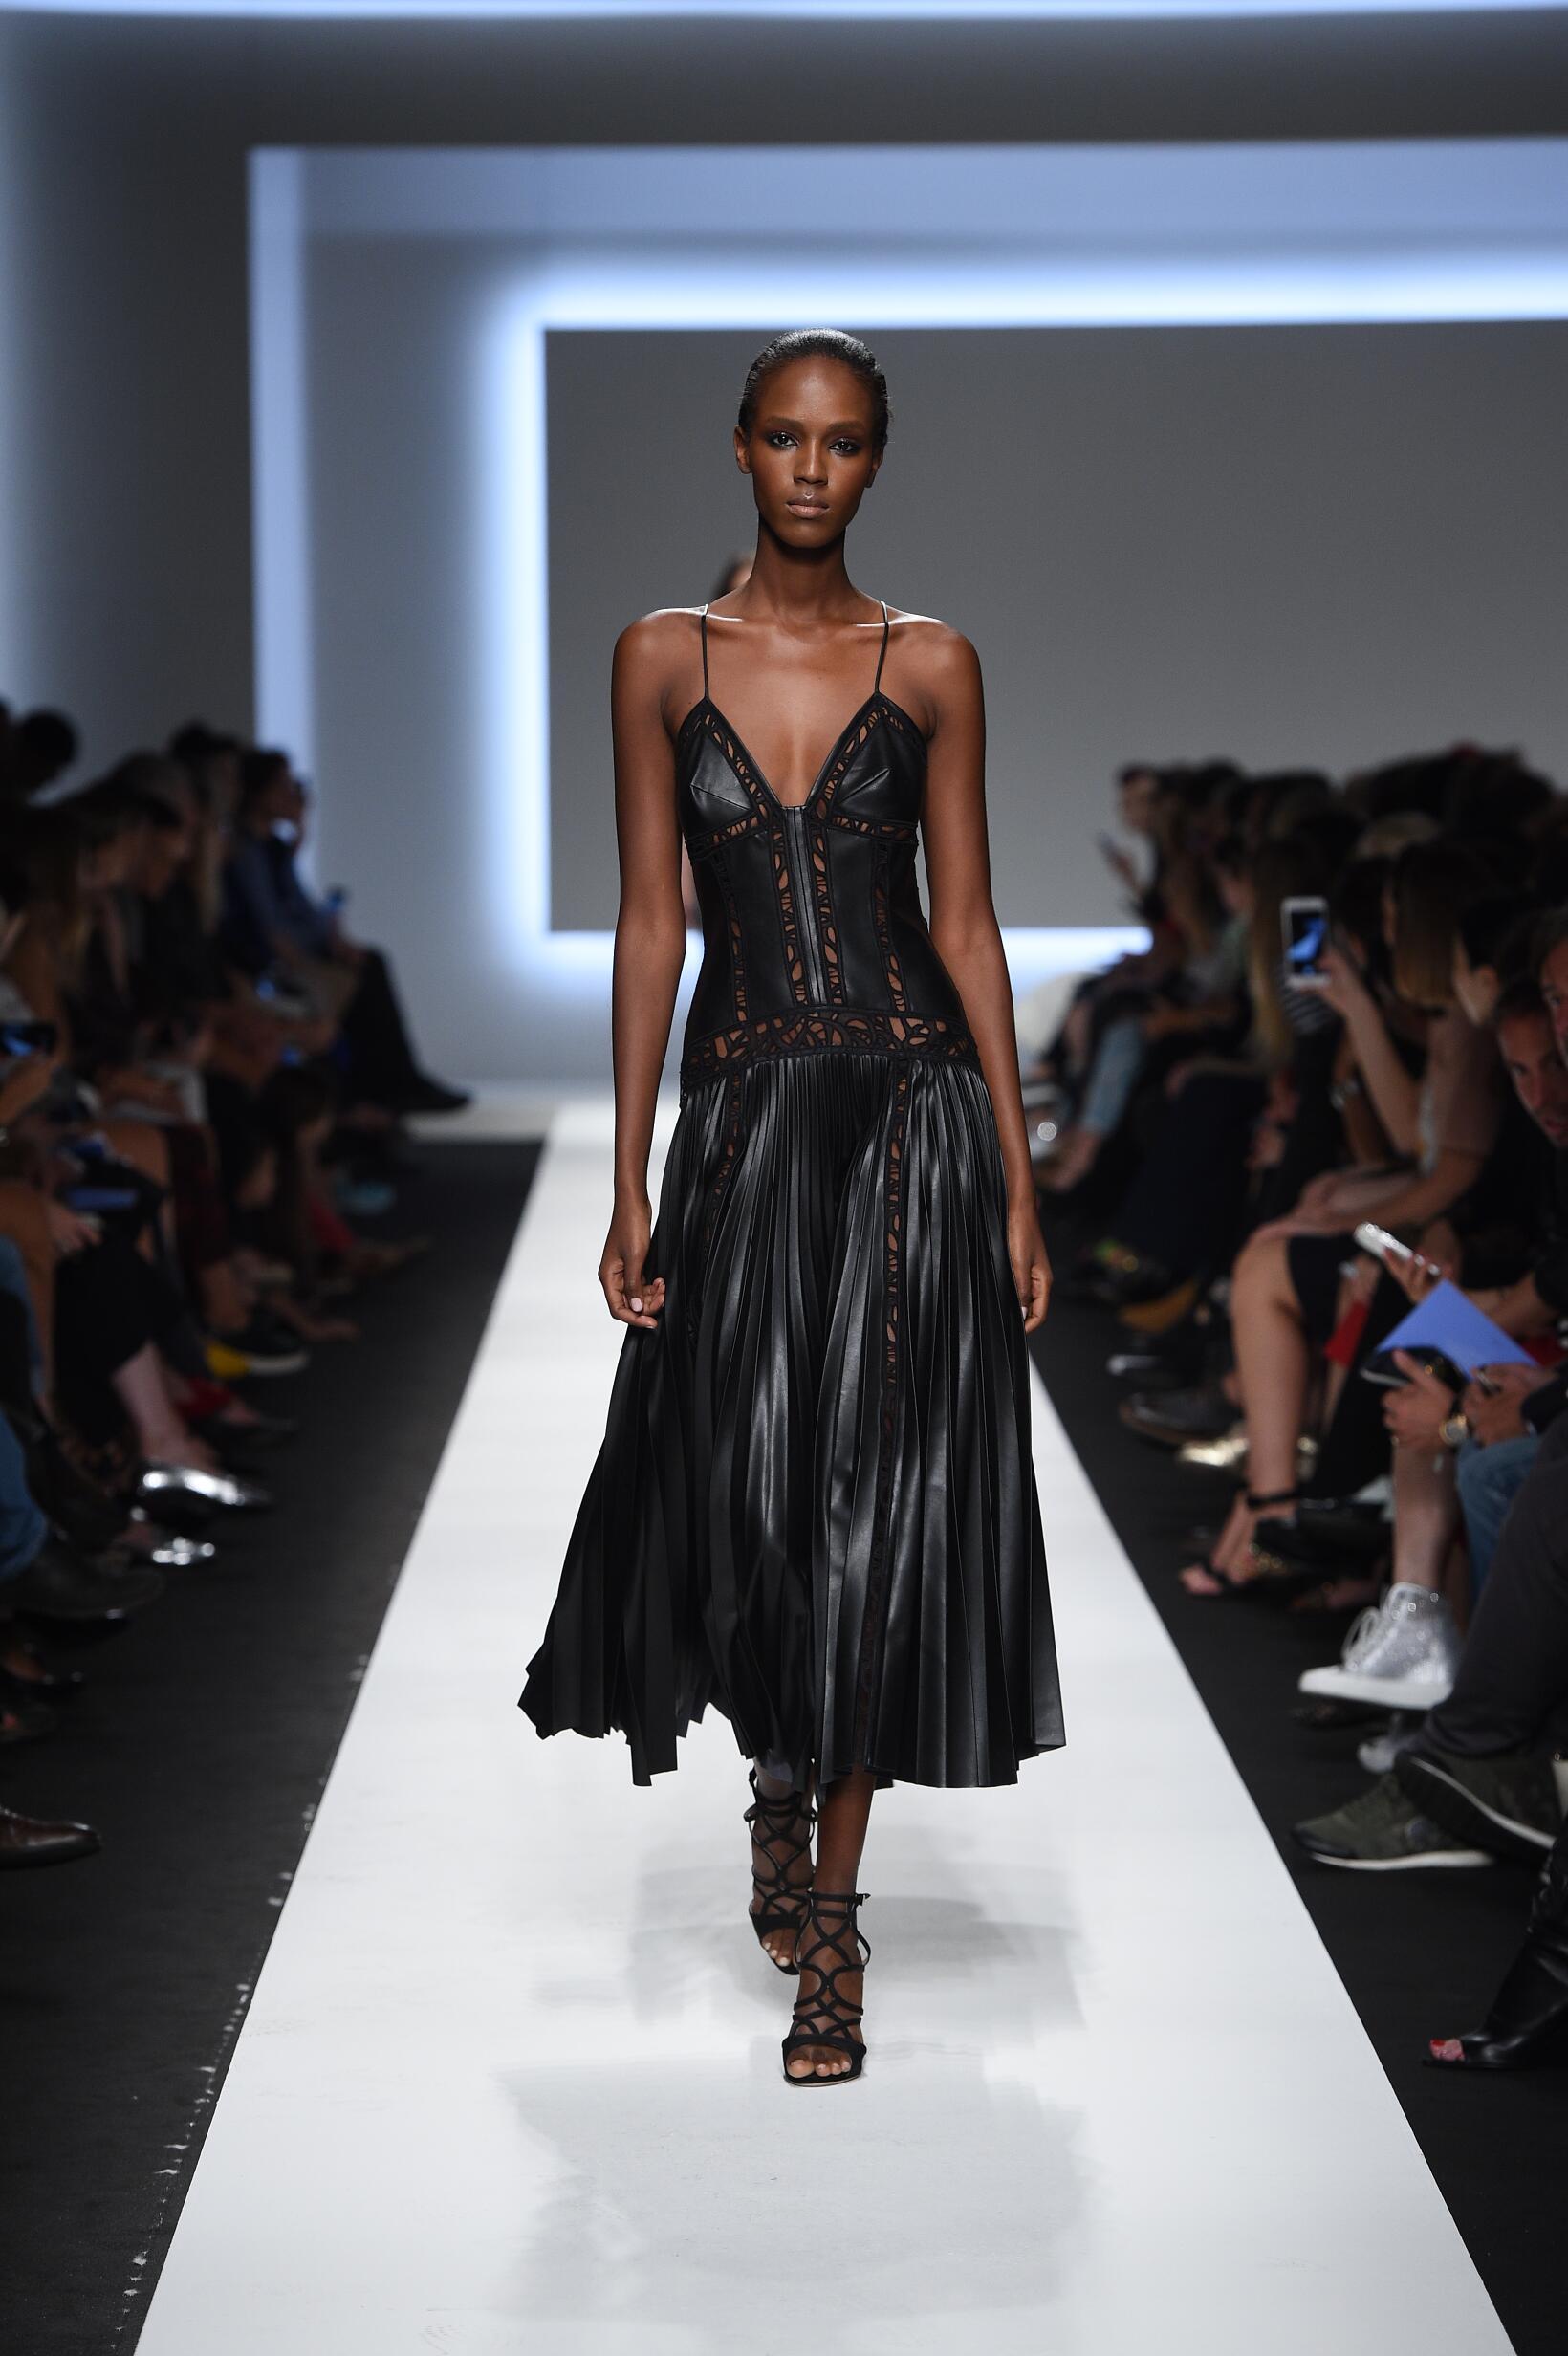 2016 Catwalk Ermanno Scervino Woman Fashion Show Summer